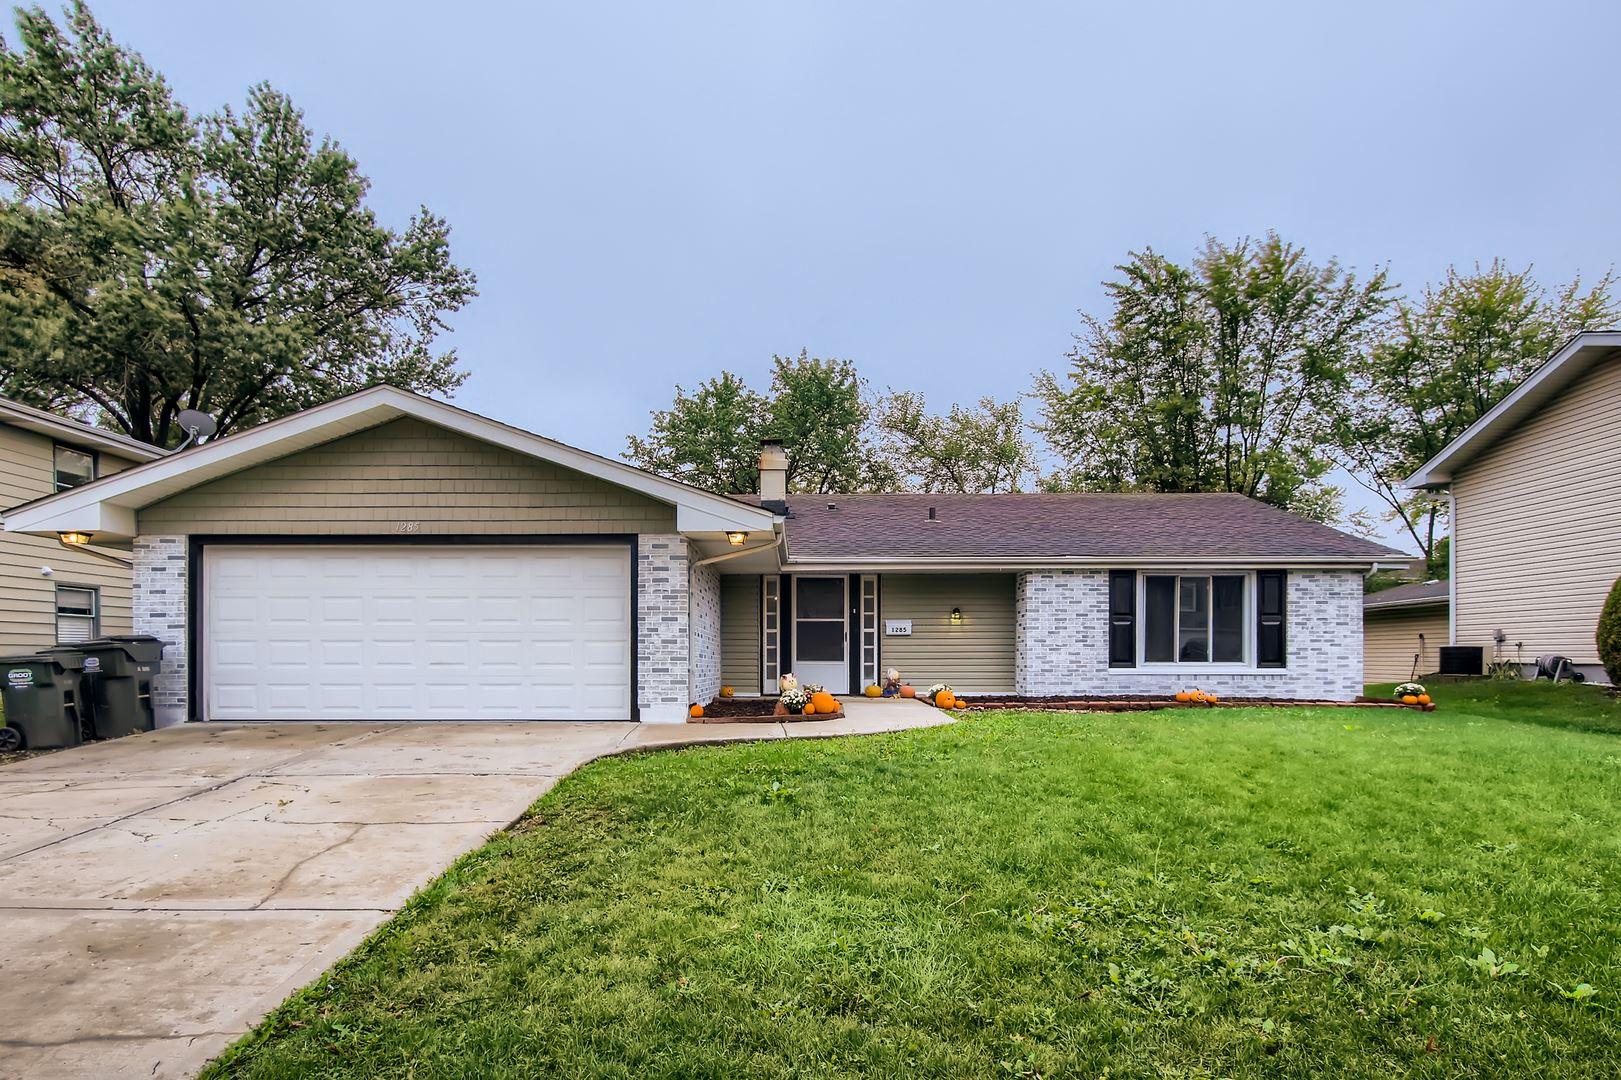 1285 Campbell Lane, Hoffman Estates, IL 60169 - #: 11229937